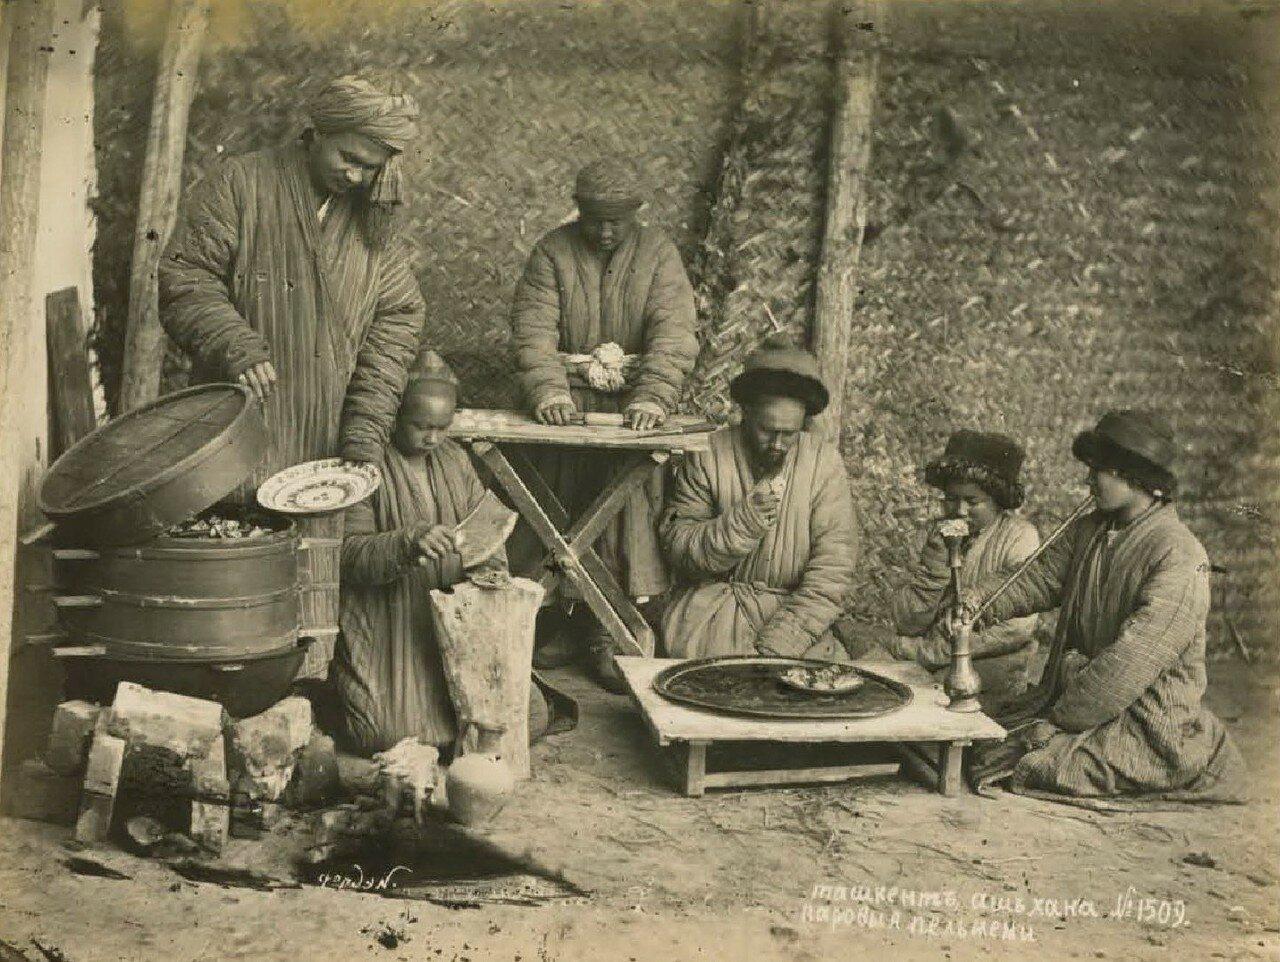 Ташкент. Чайхана. Паровые пельмени